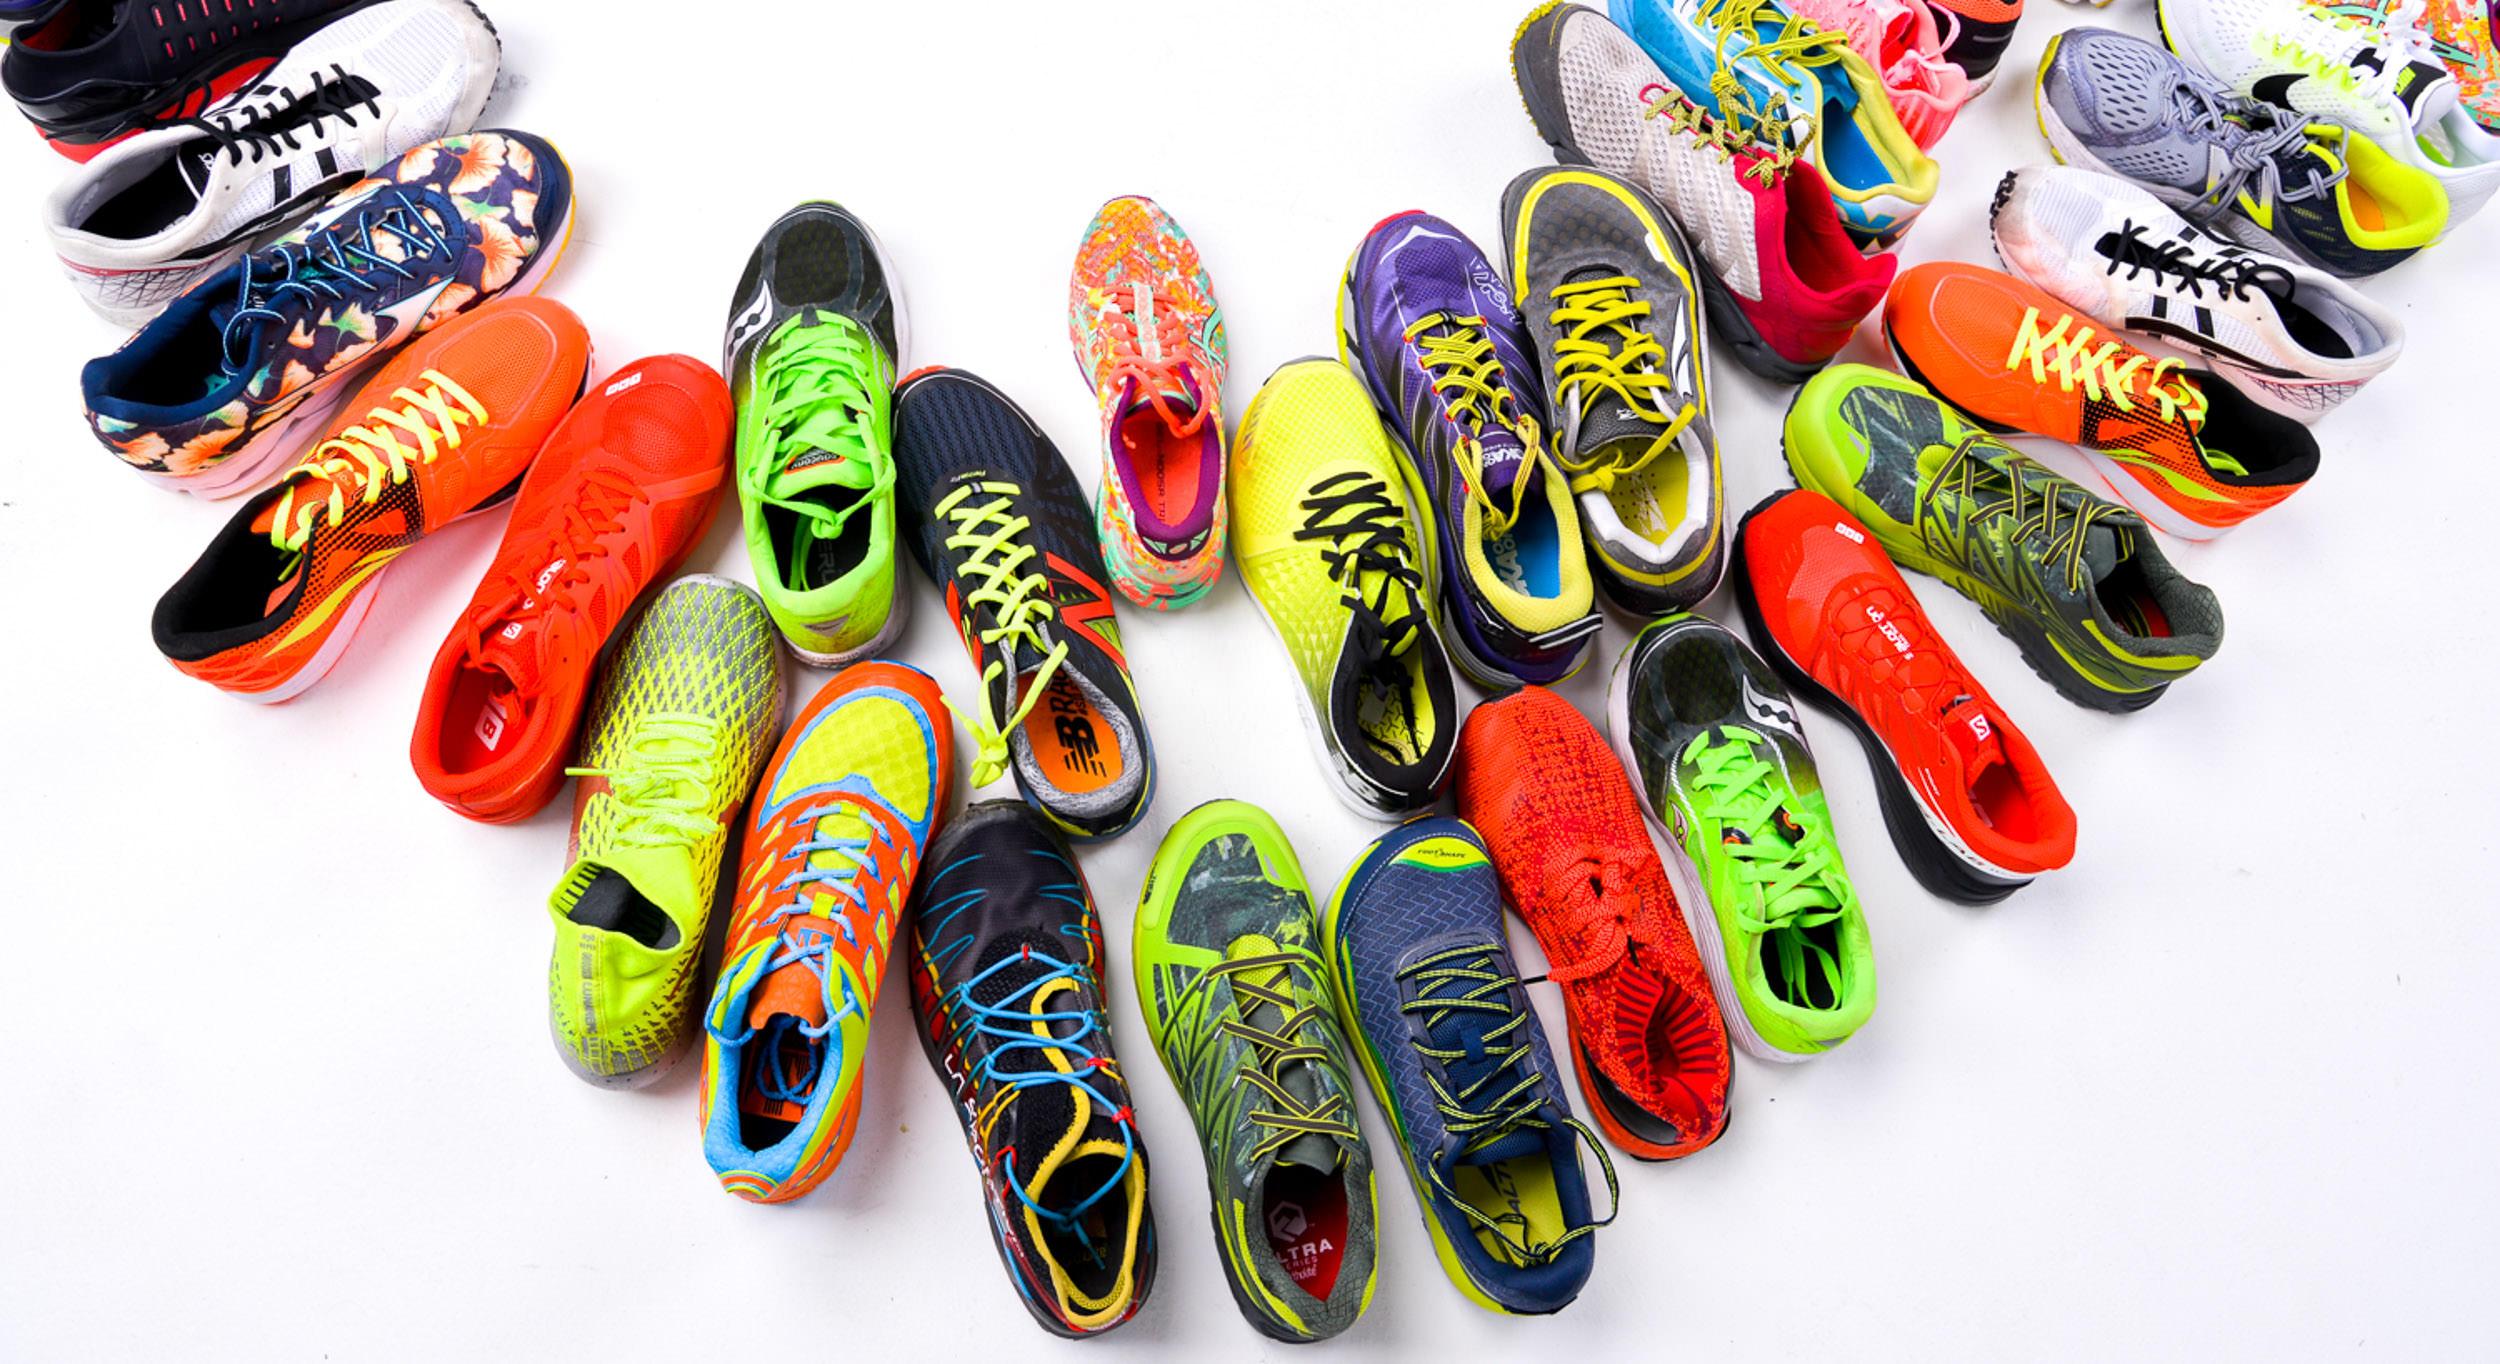 TopX | 捂好钱包 2017年不可错过的12双新款跑鞋